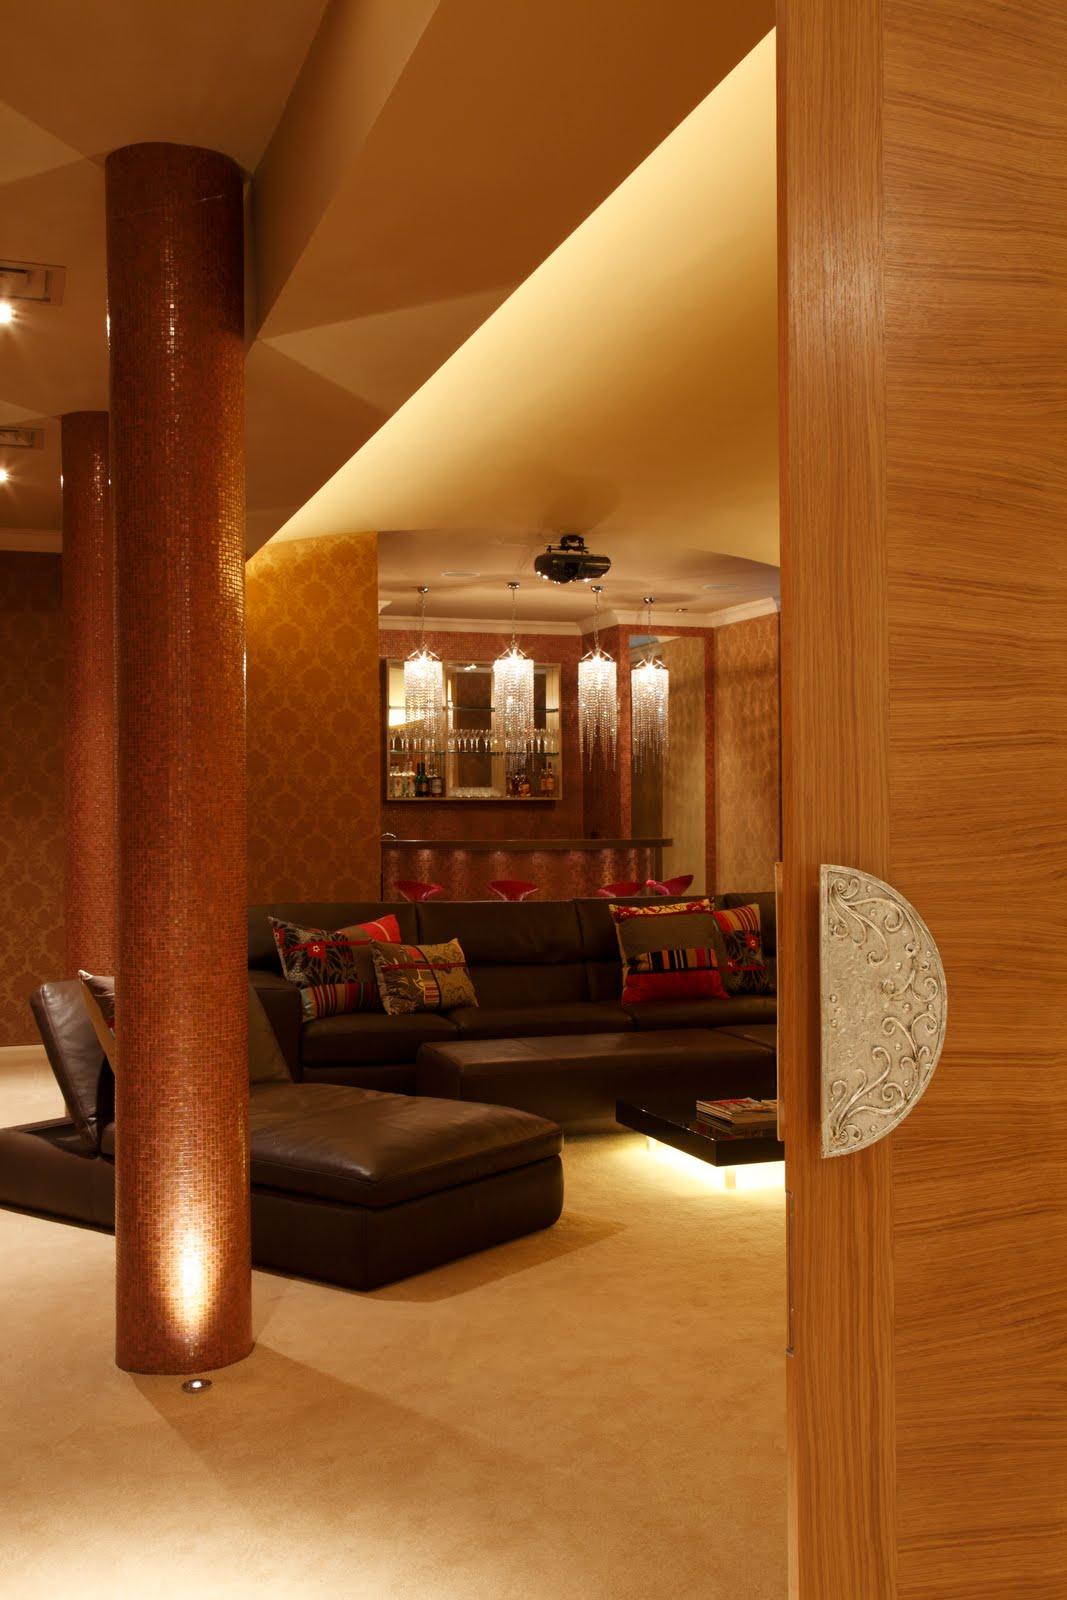 Home interior luxury lighting sofa living room interior design d